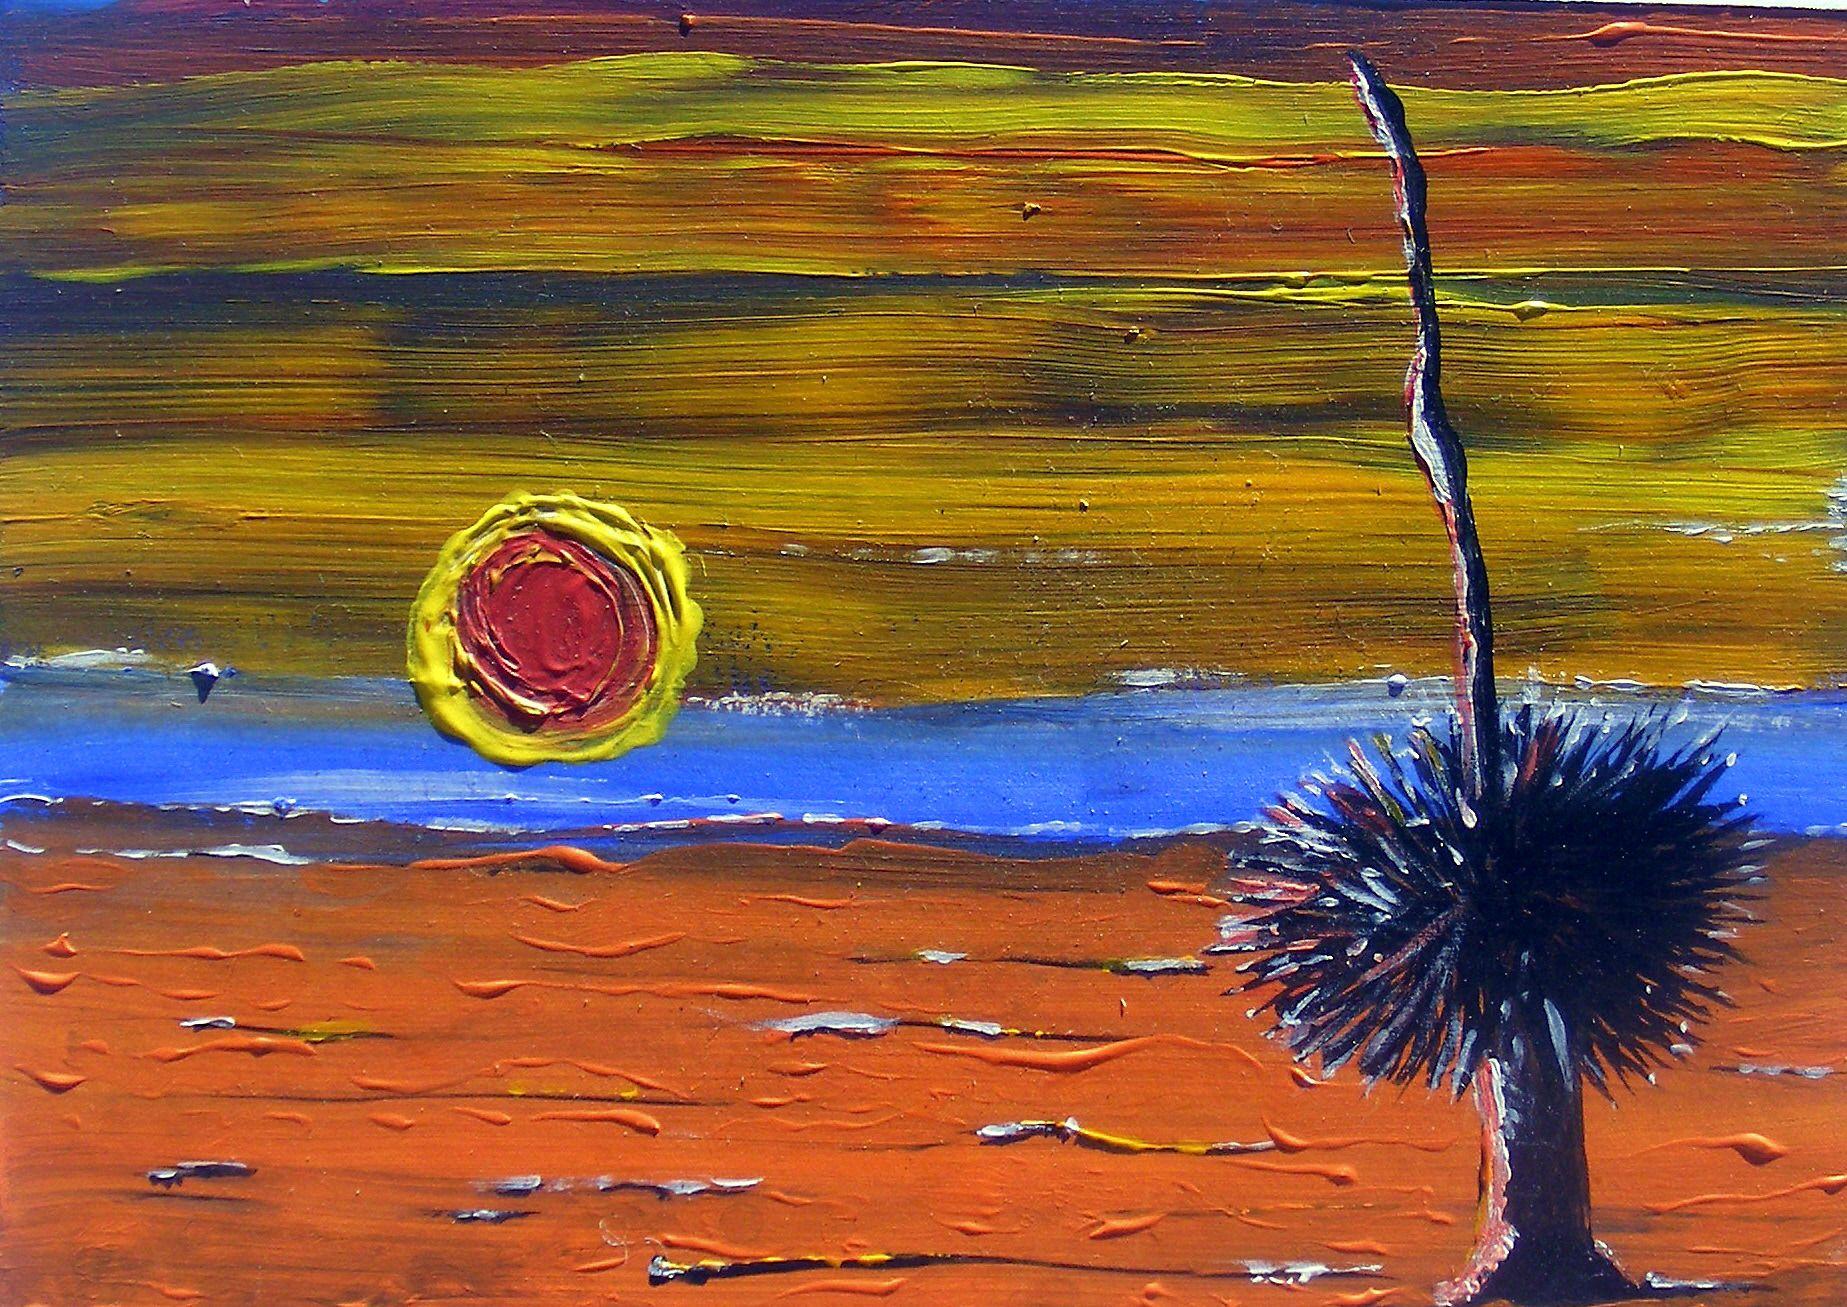 My Art. Paradise my Arse. Acrylic on canvas board.